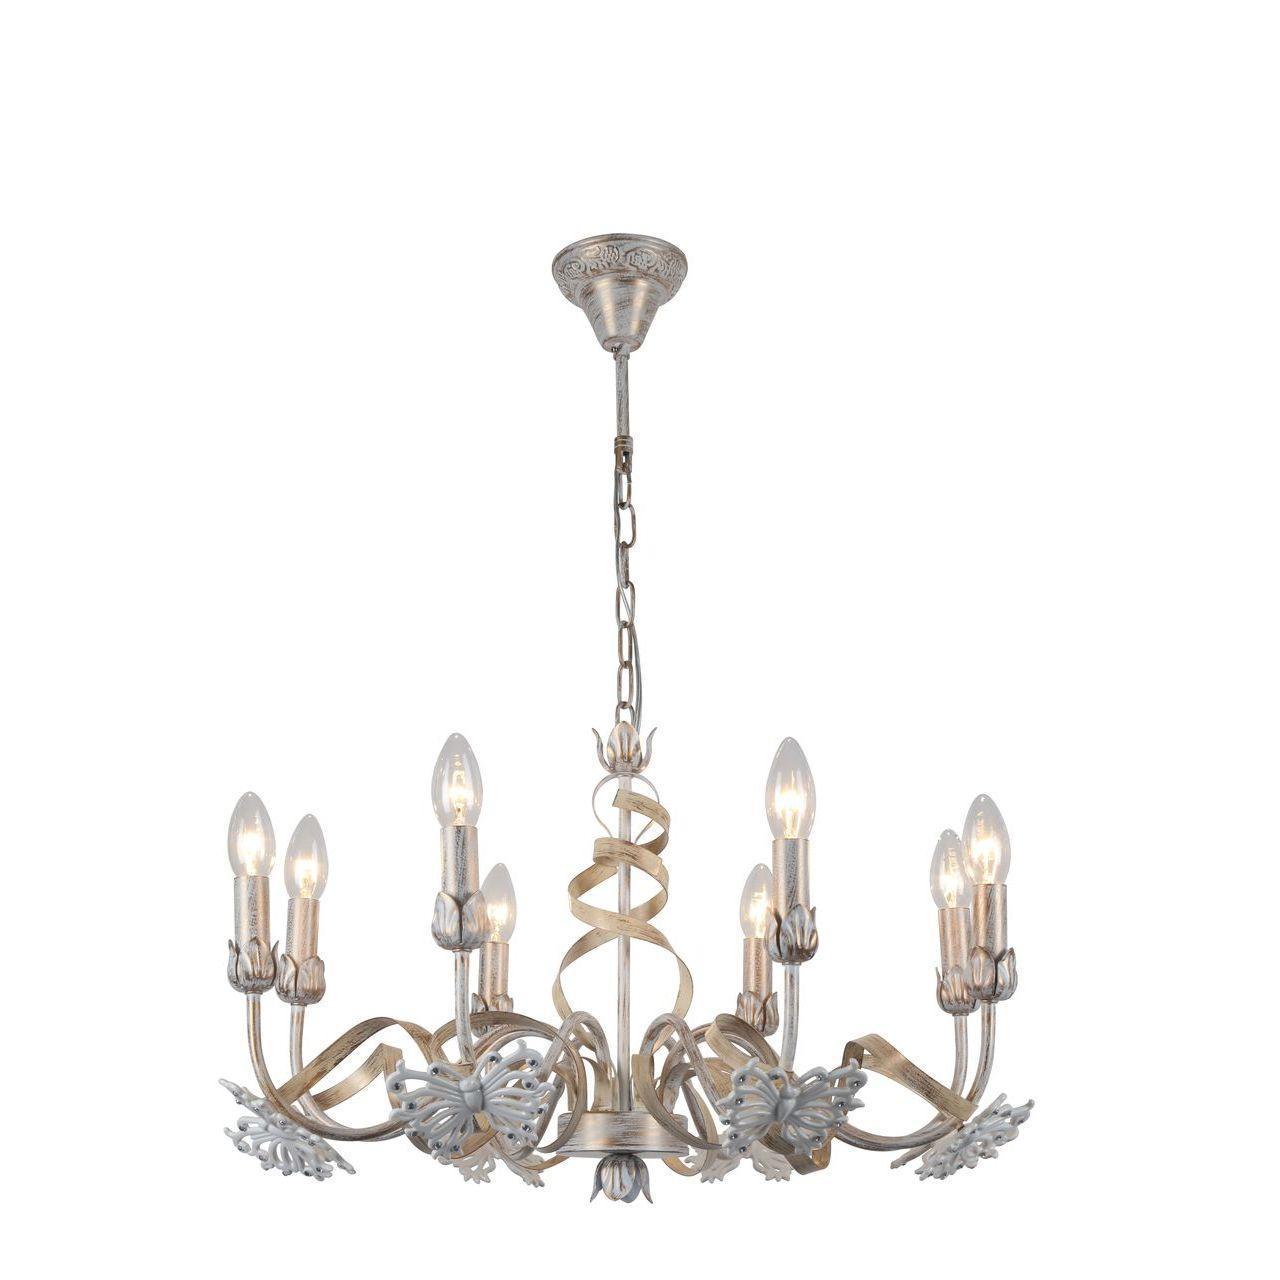 Люстра Arte Lamp Libellula A8626LM-8WG подвесная подвесная люстра arte lamp tilly a5333lm 8wg